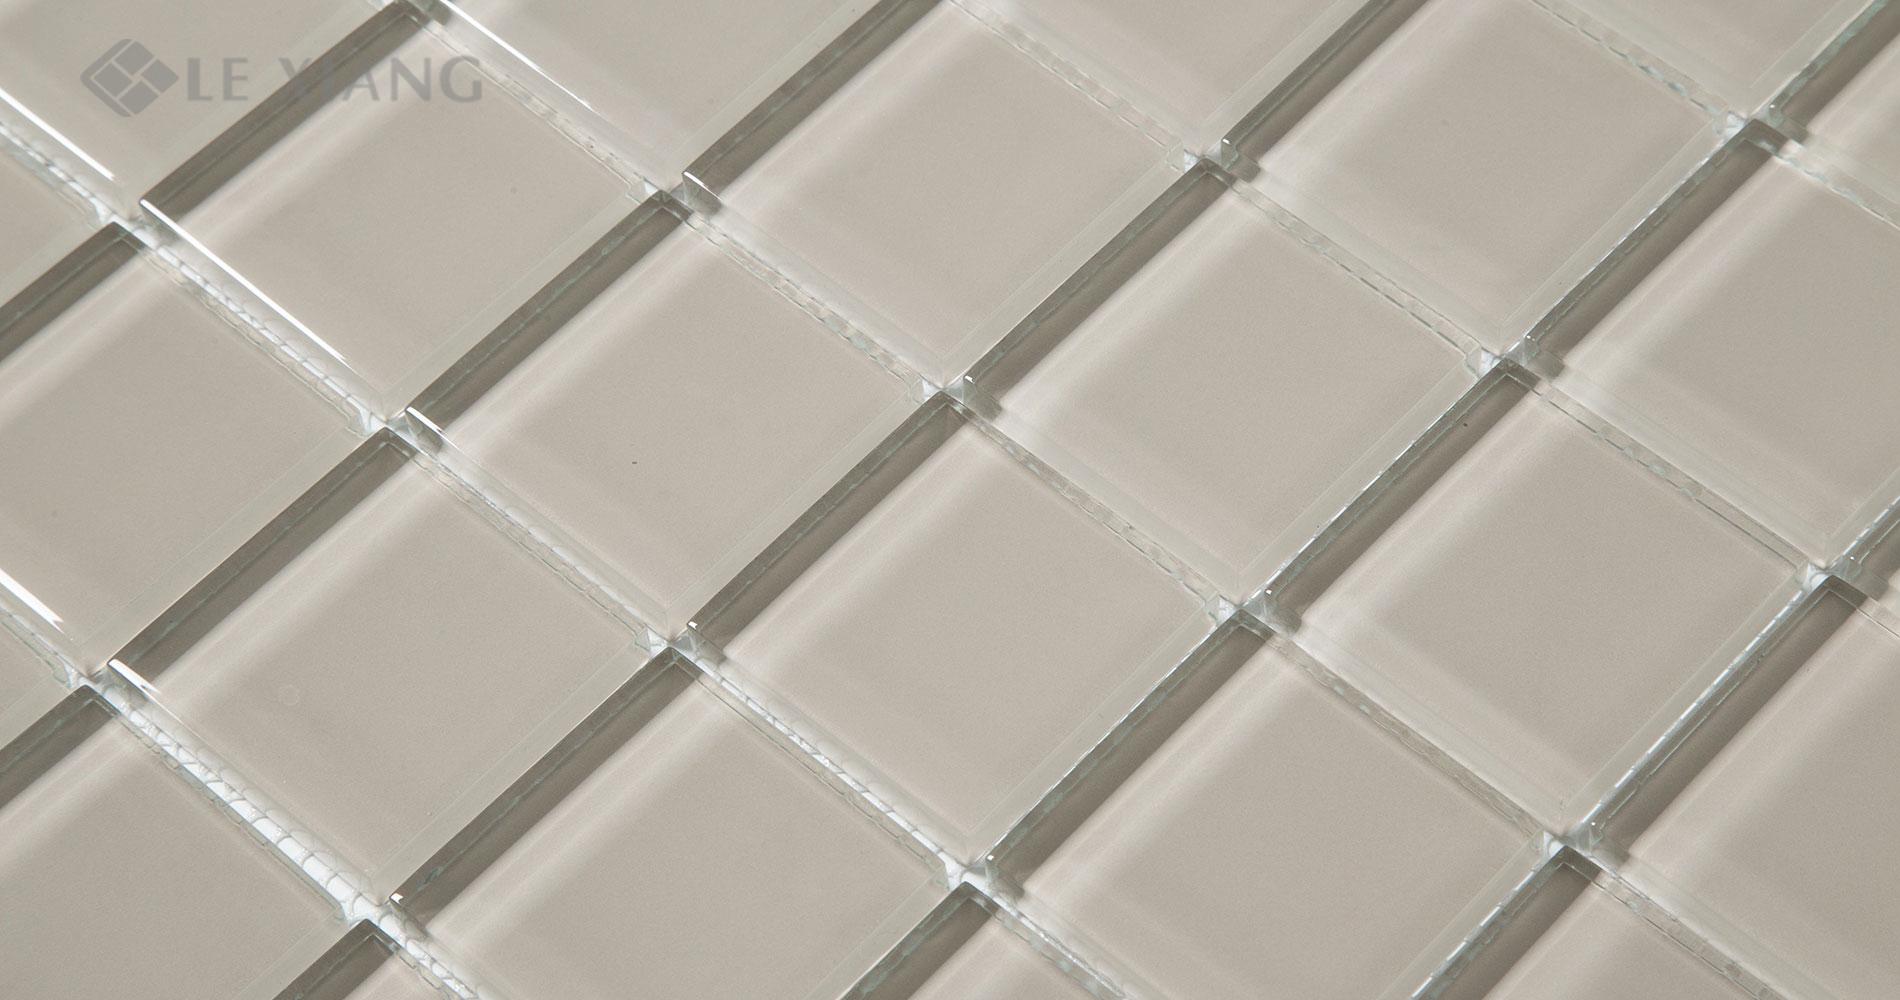 48mm-Square-Crystal-Glass-Mosaic-Backsplash-Tiles-21